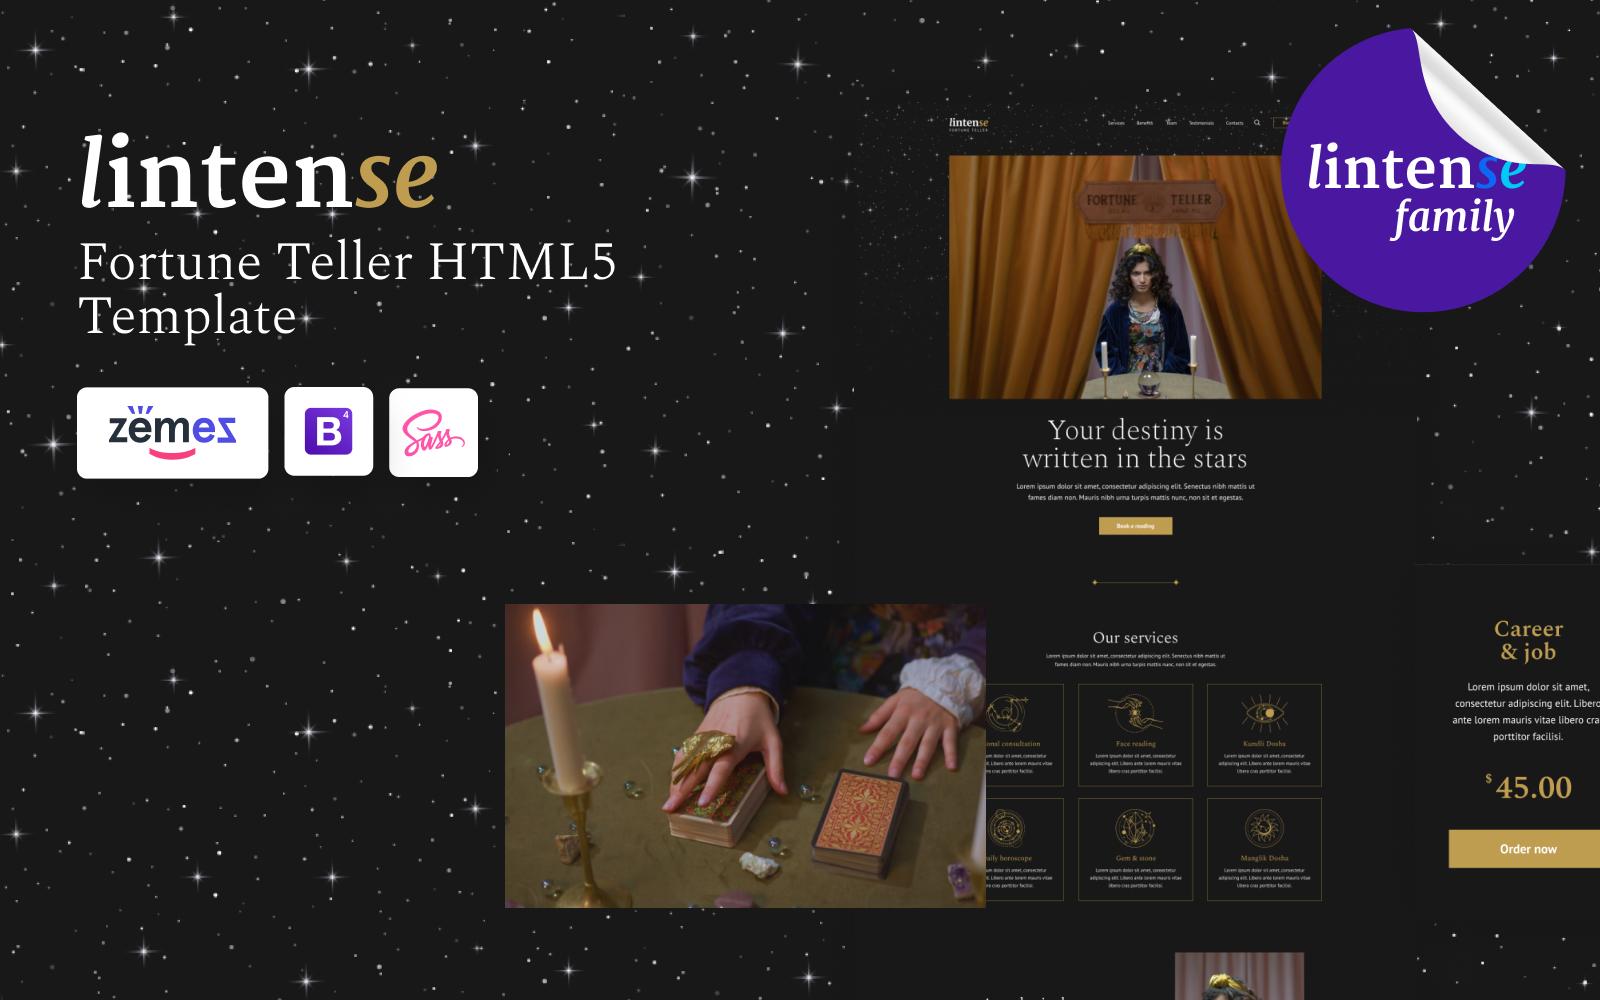 Lintense - Fortune-Teller Landing Page Template